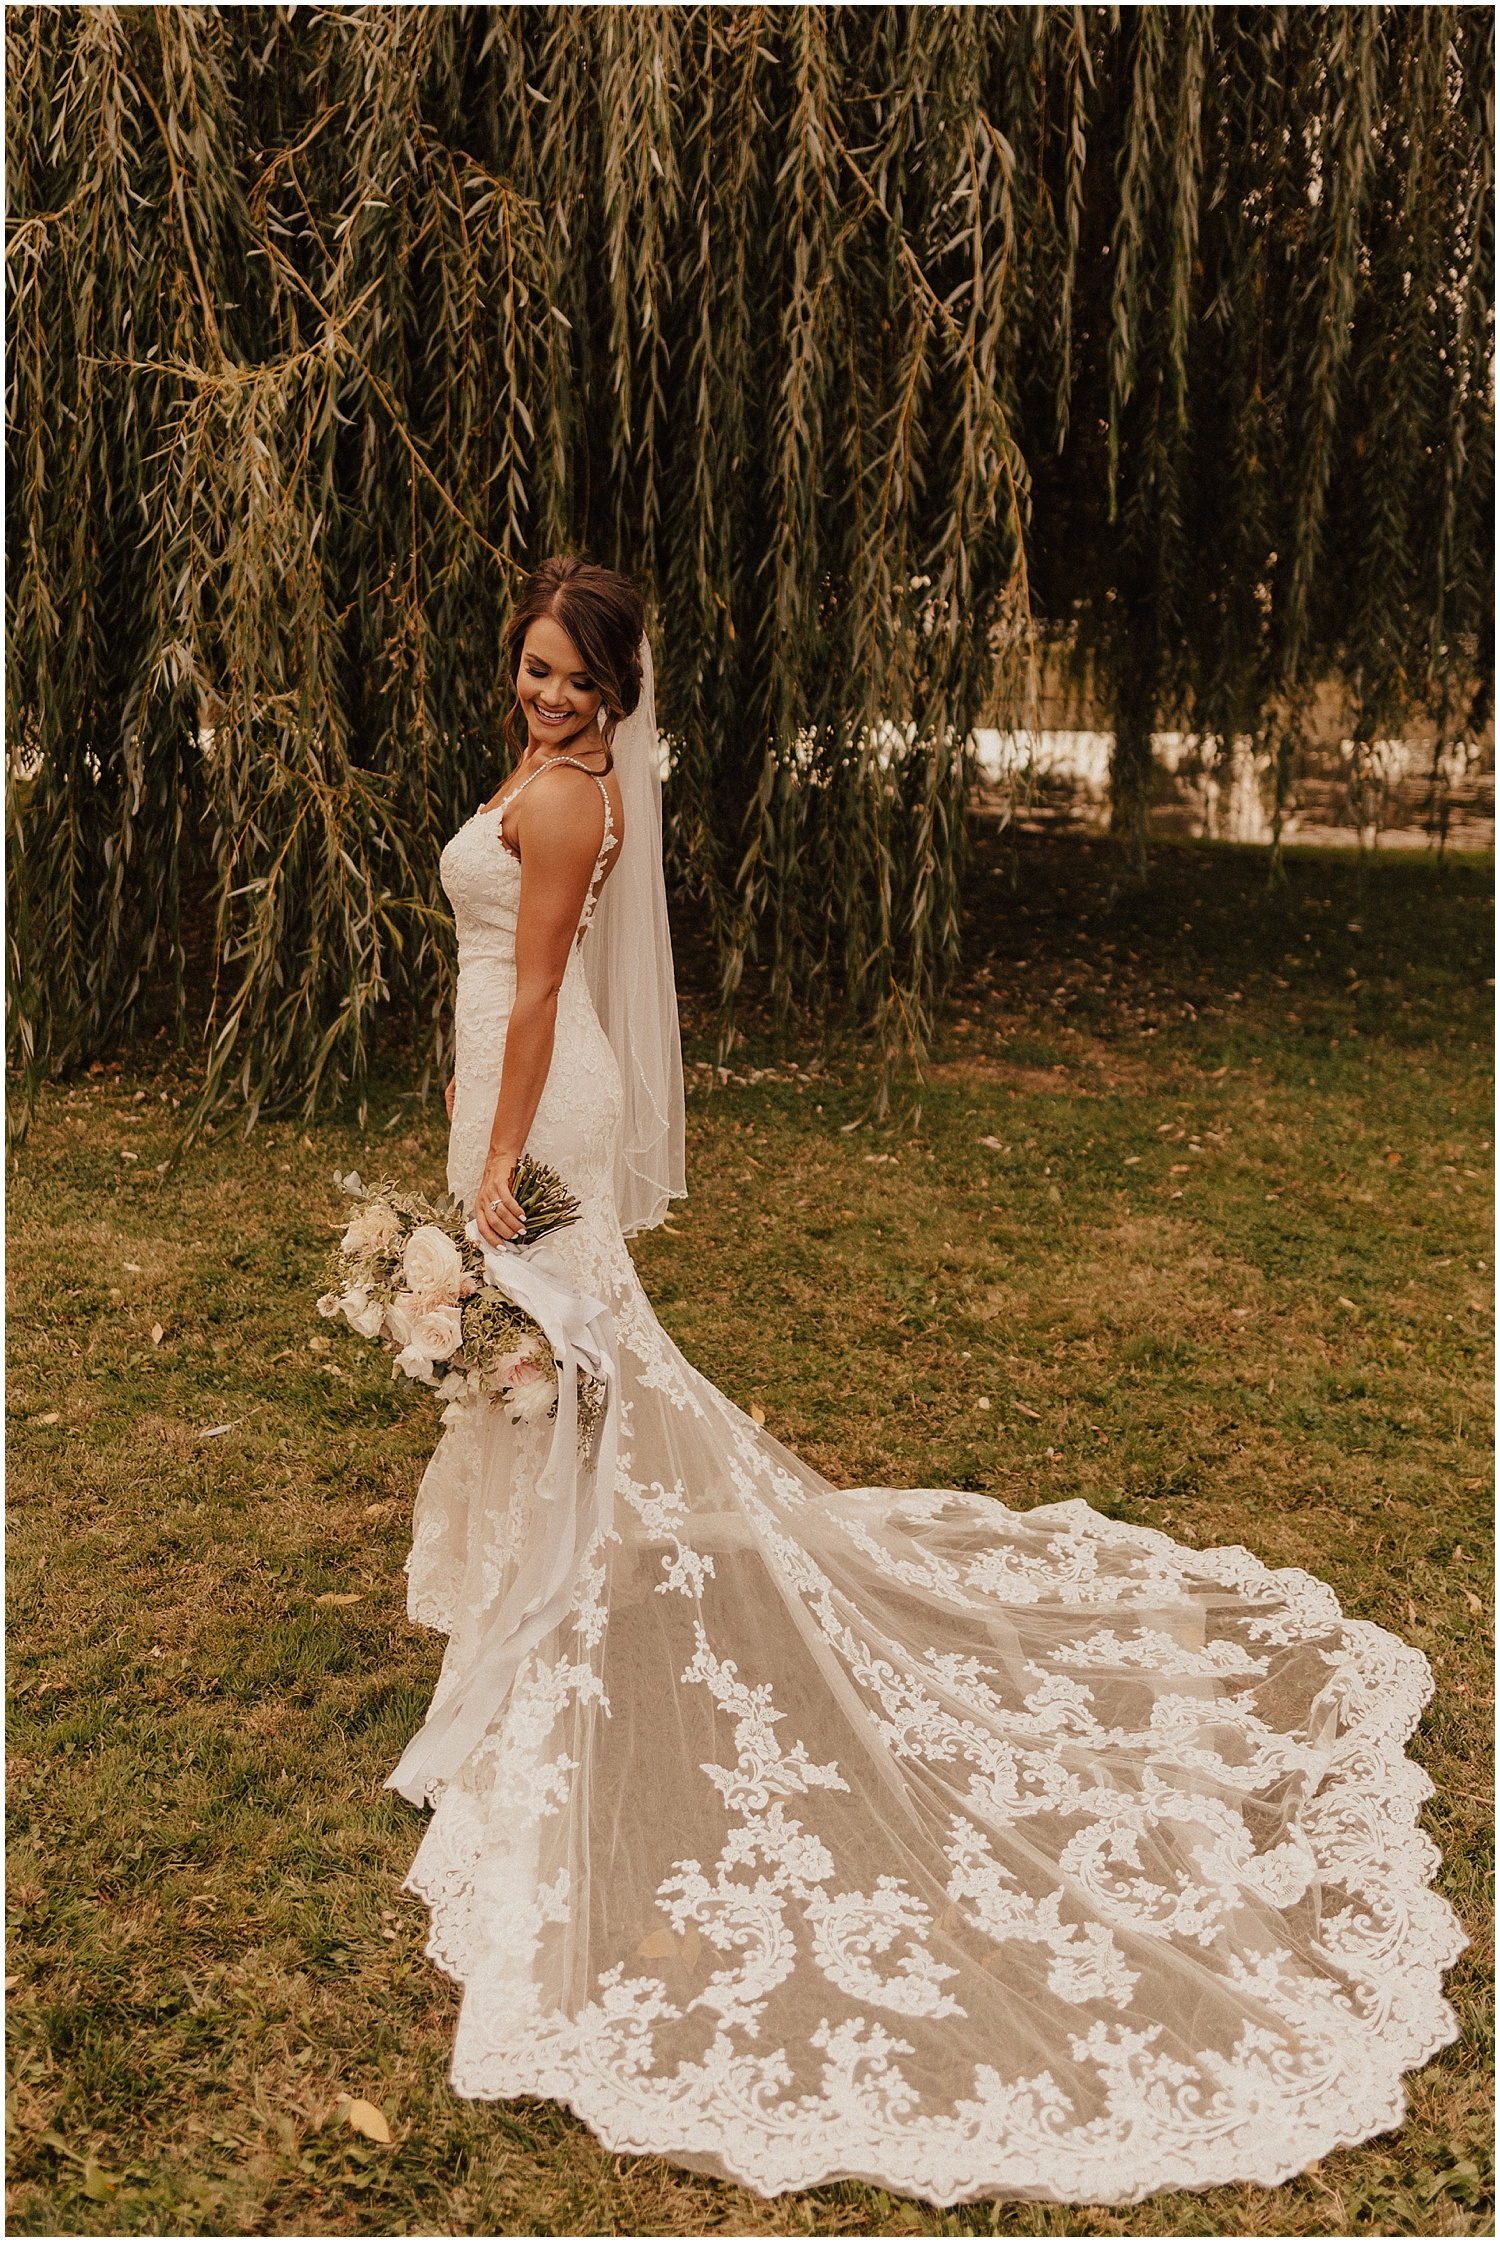 whimsical-summer-wedding-boise-idaho-las-vegas-bride158.jpg